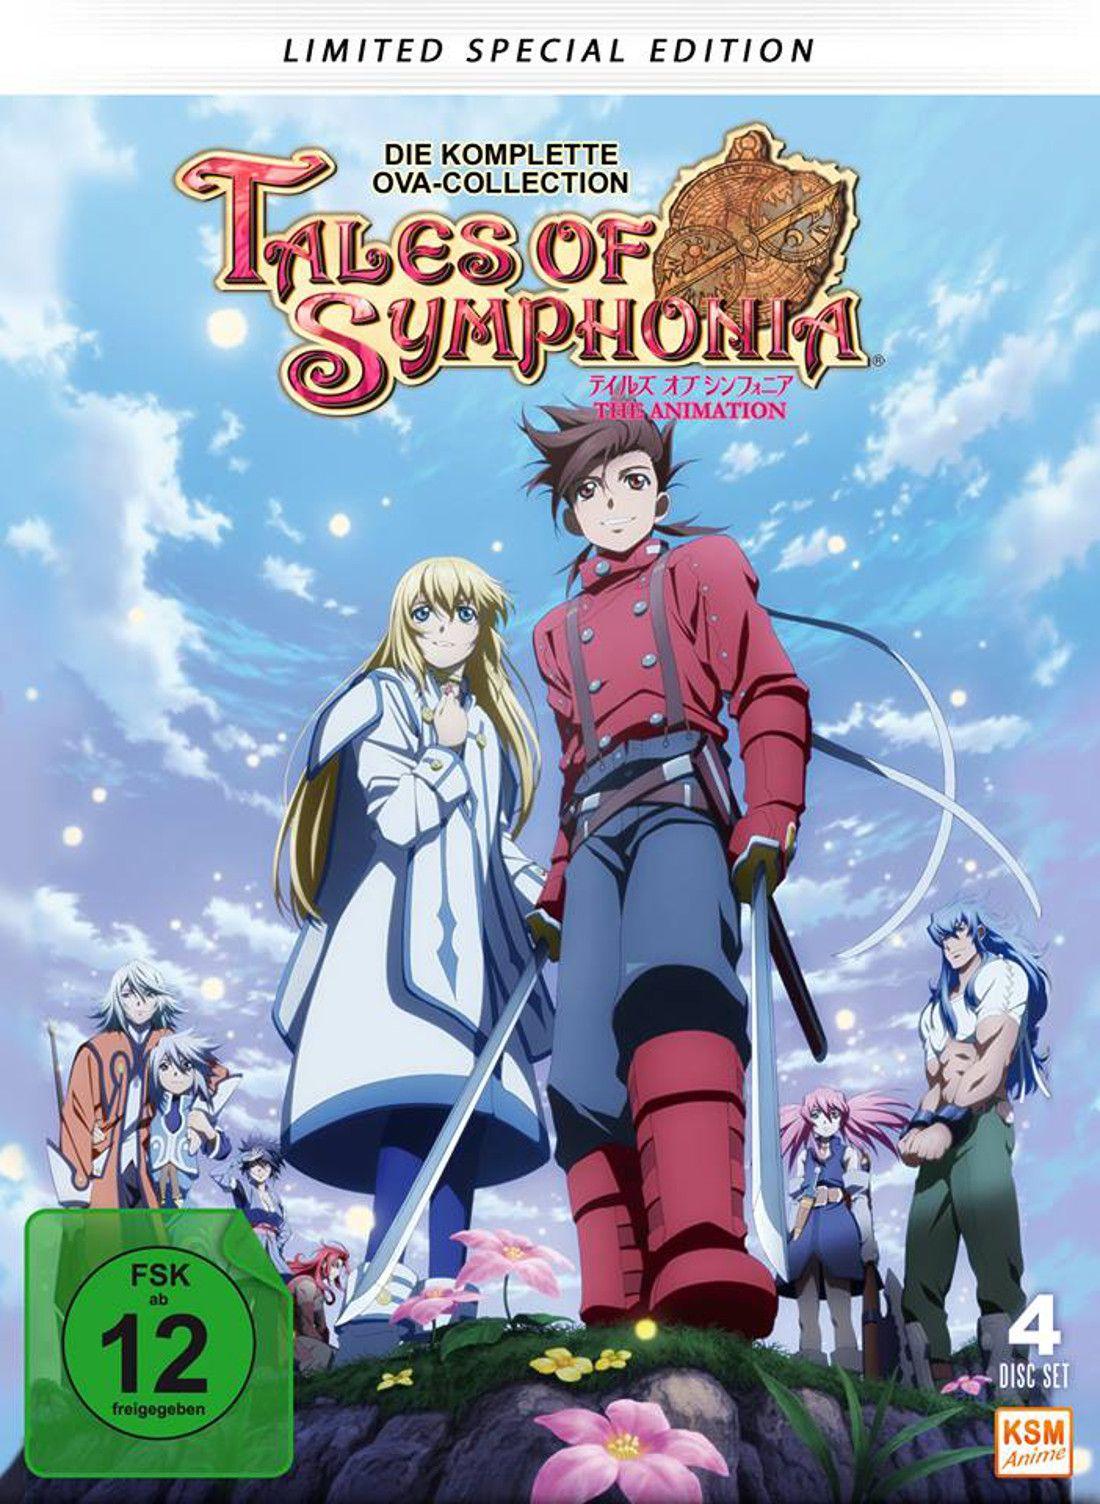 Tales of Symphonia KSM Anime stellt finales Artwork der